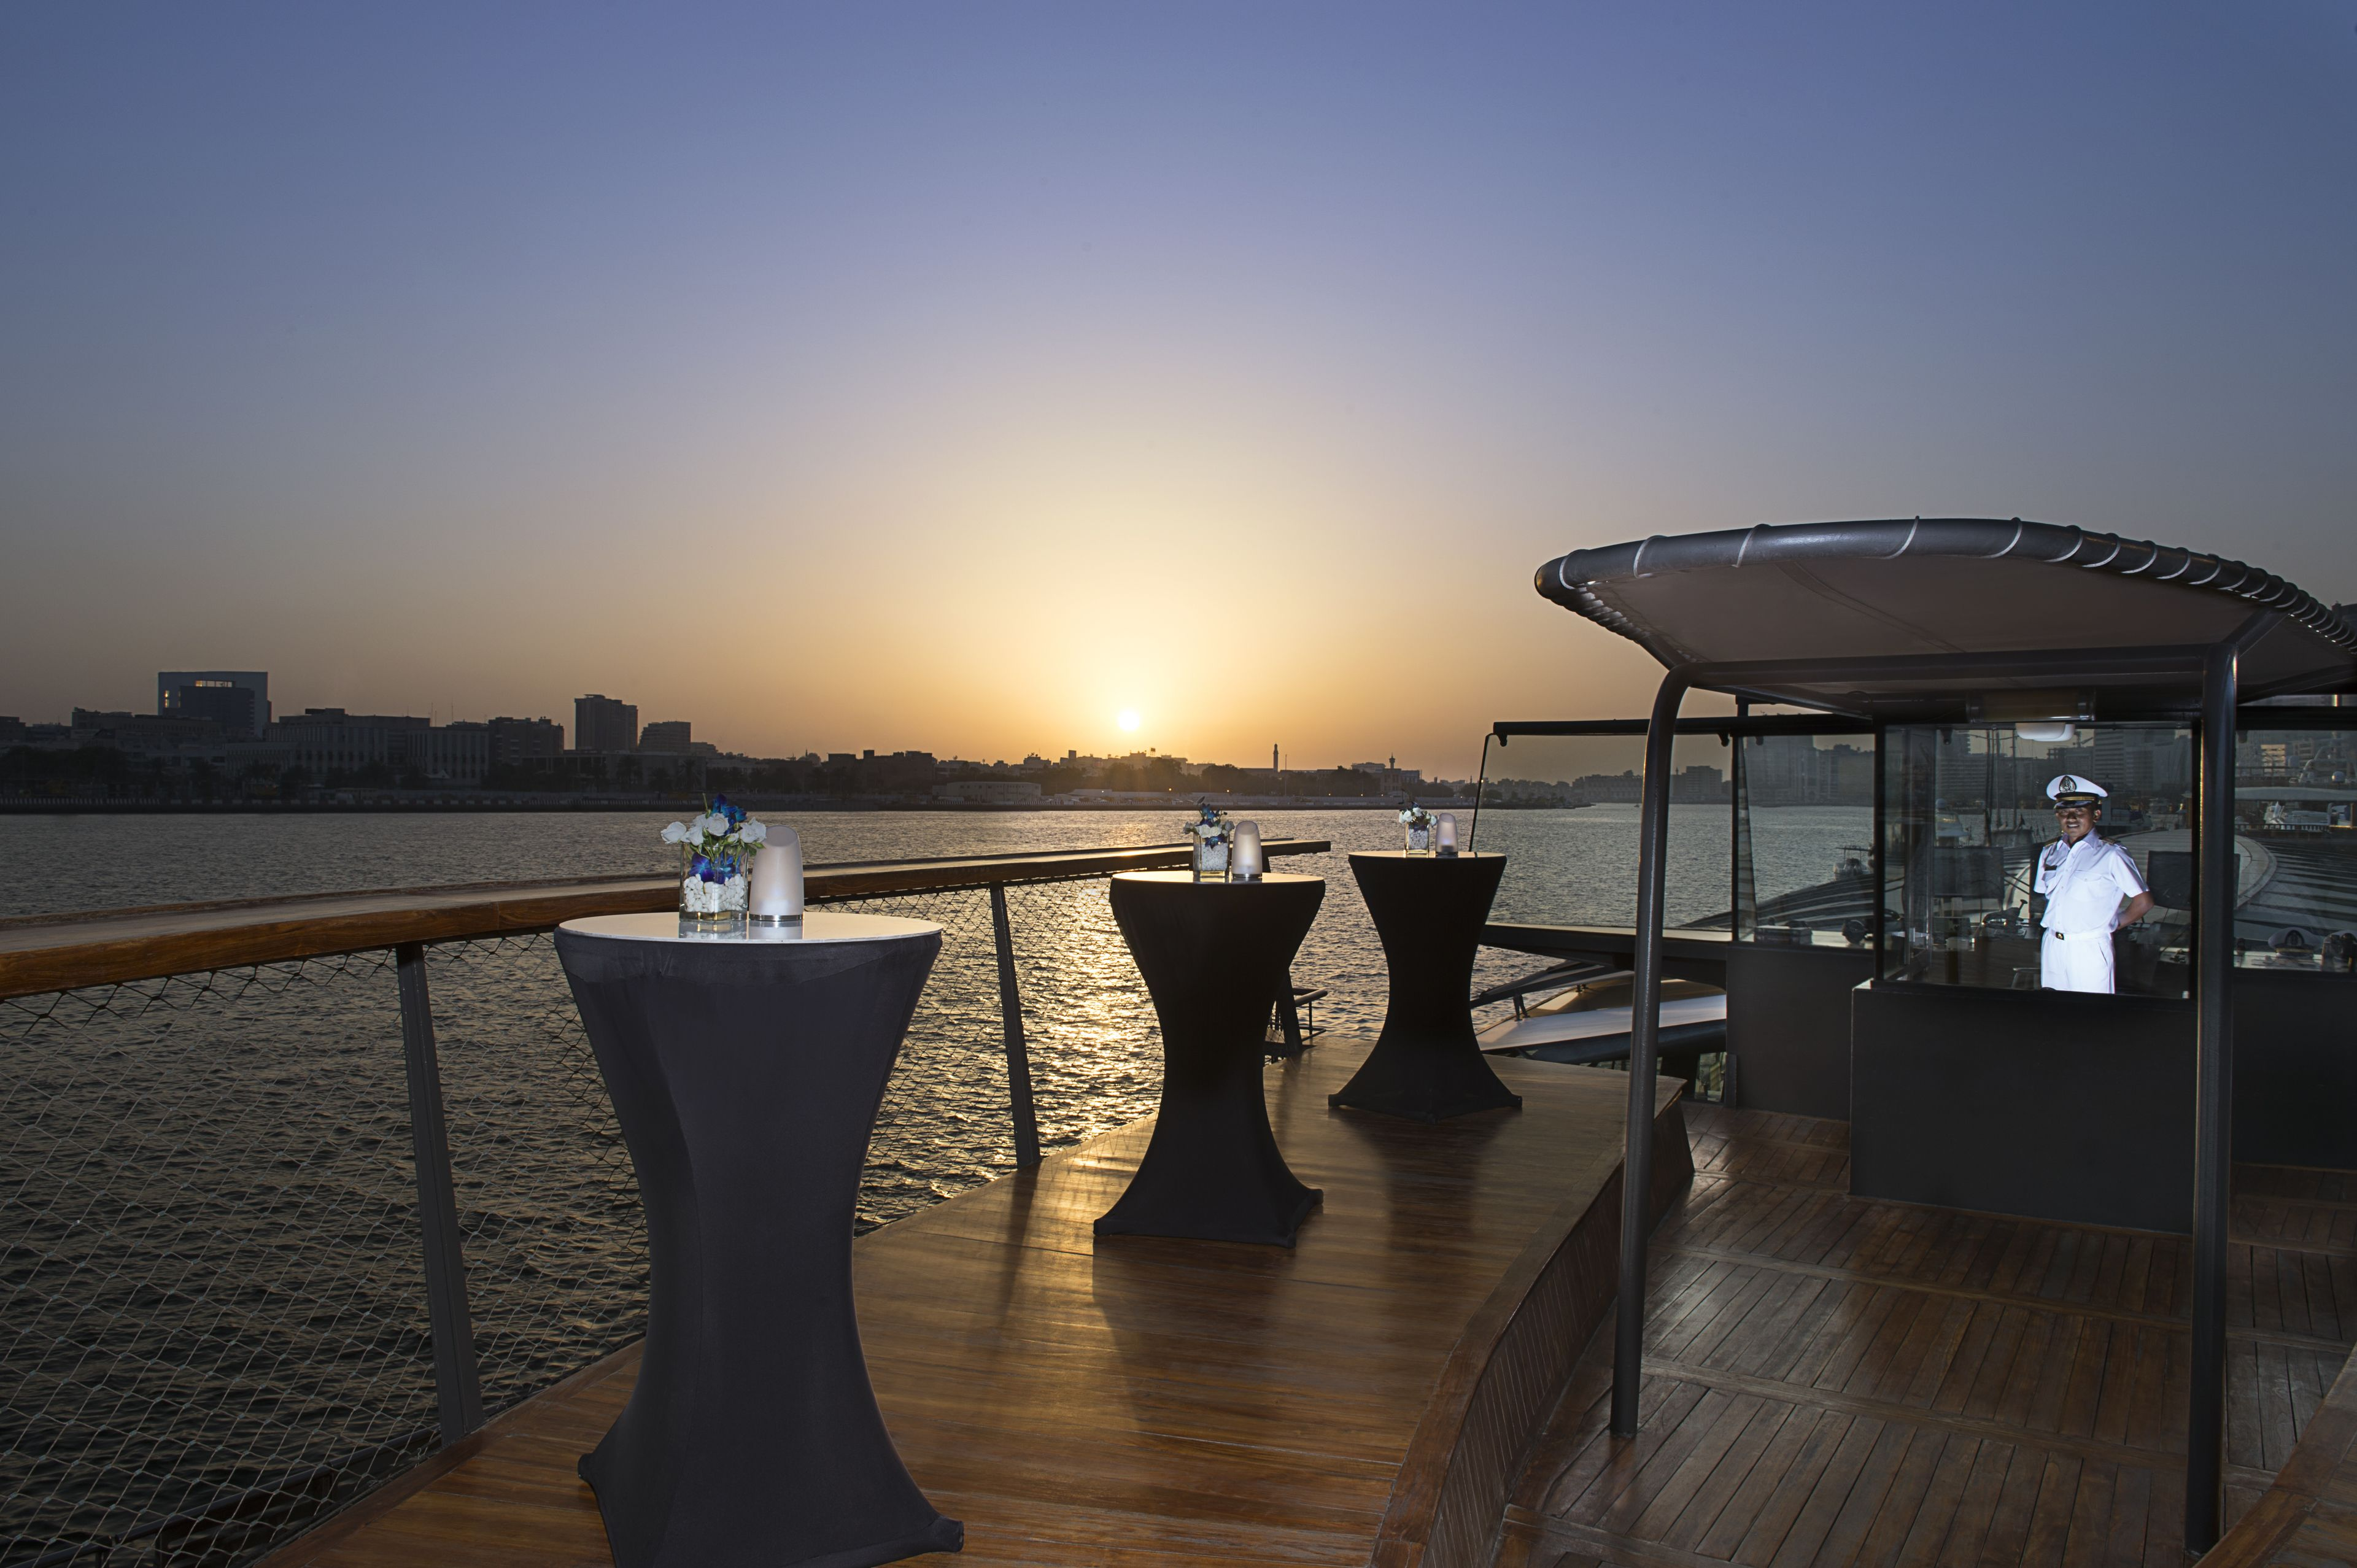 Bateaux Dubai middagskryssning